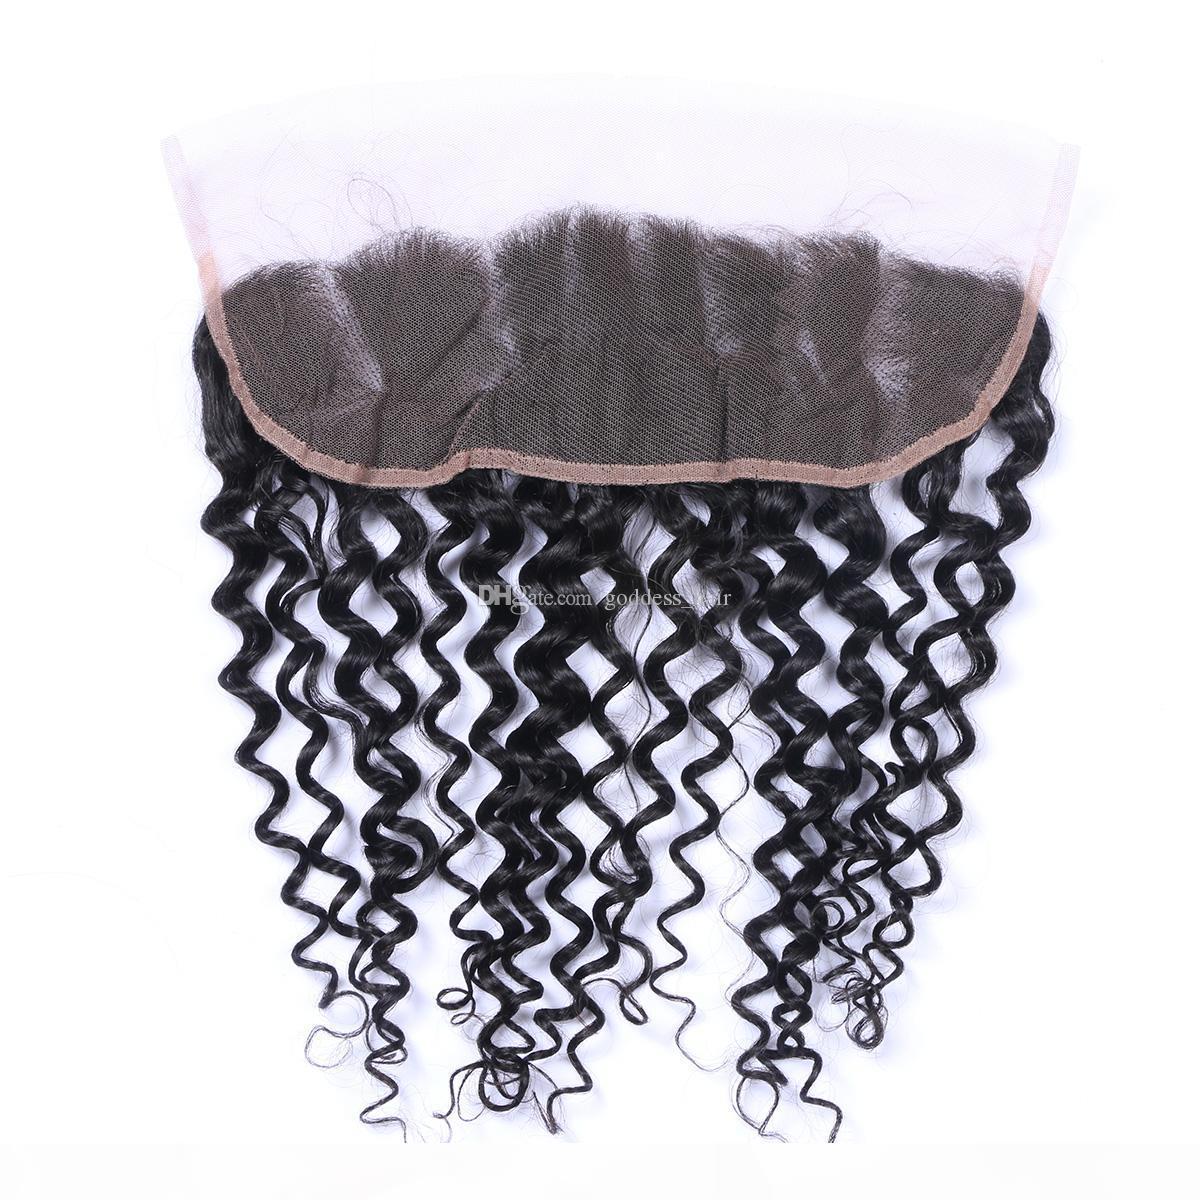 Vendita calda Brazilian Kinky Curly Lace Frontal Chiusura frontale 13x4 Chiusure frontali in pizzo full Afro Kinky Curly Lace Frontals Frontals Freesing